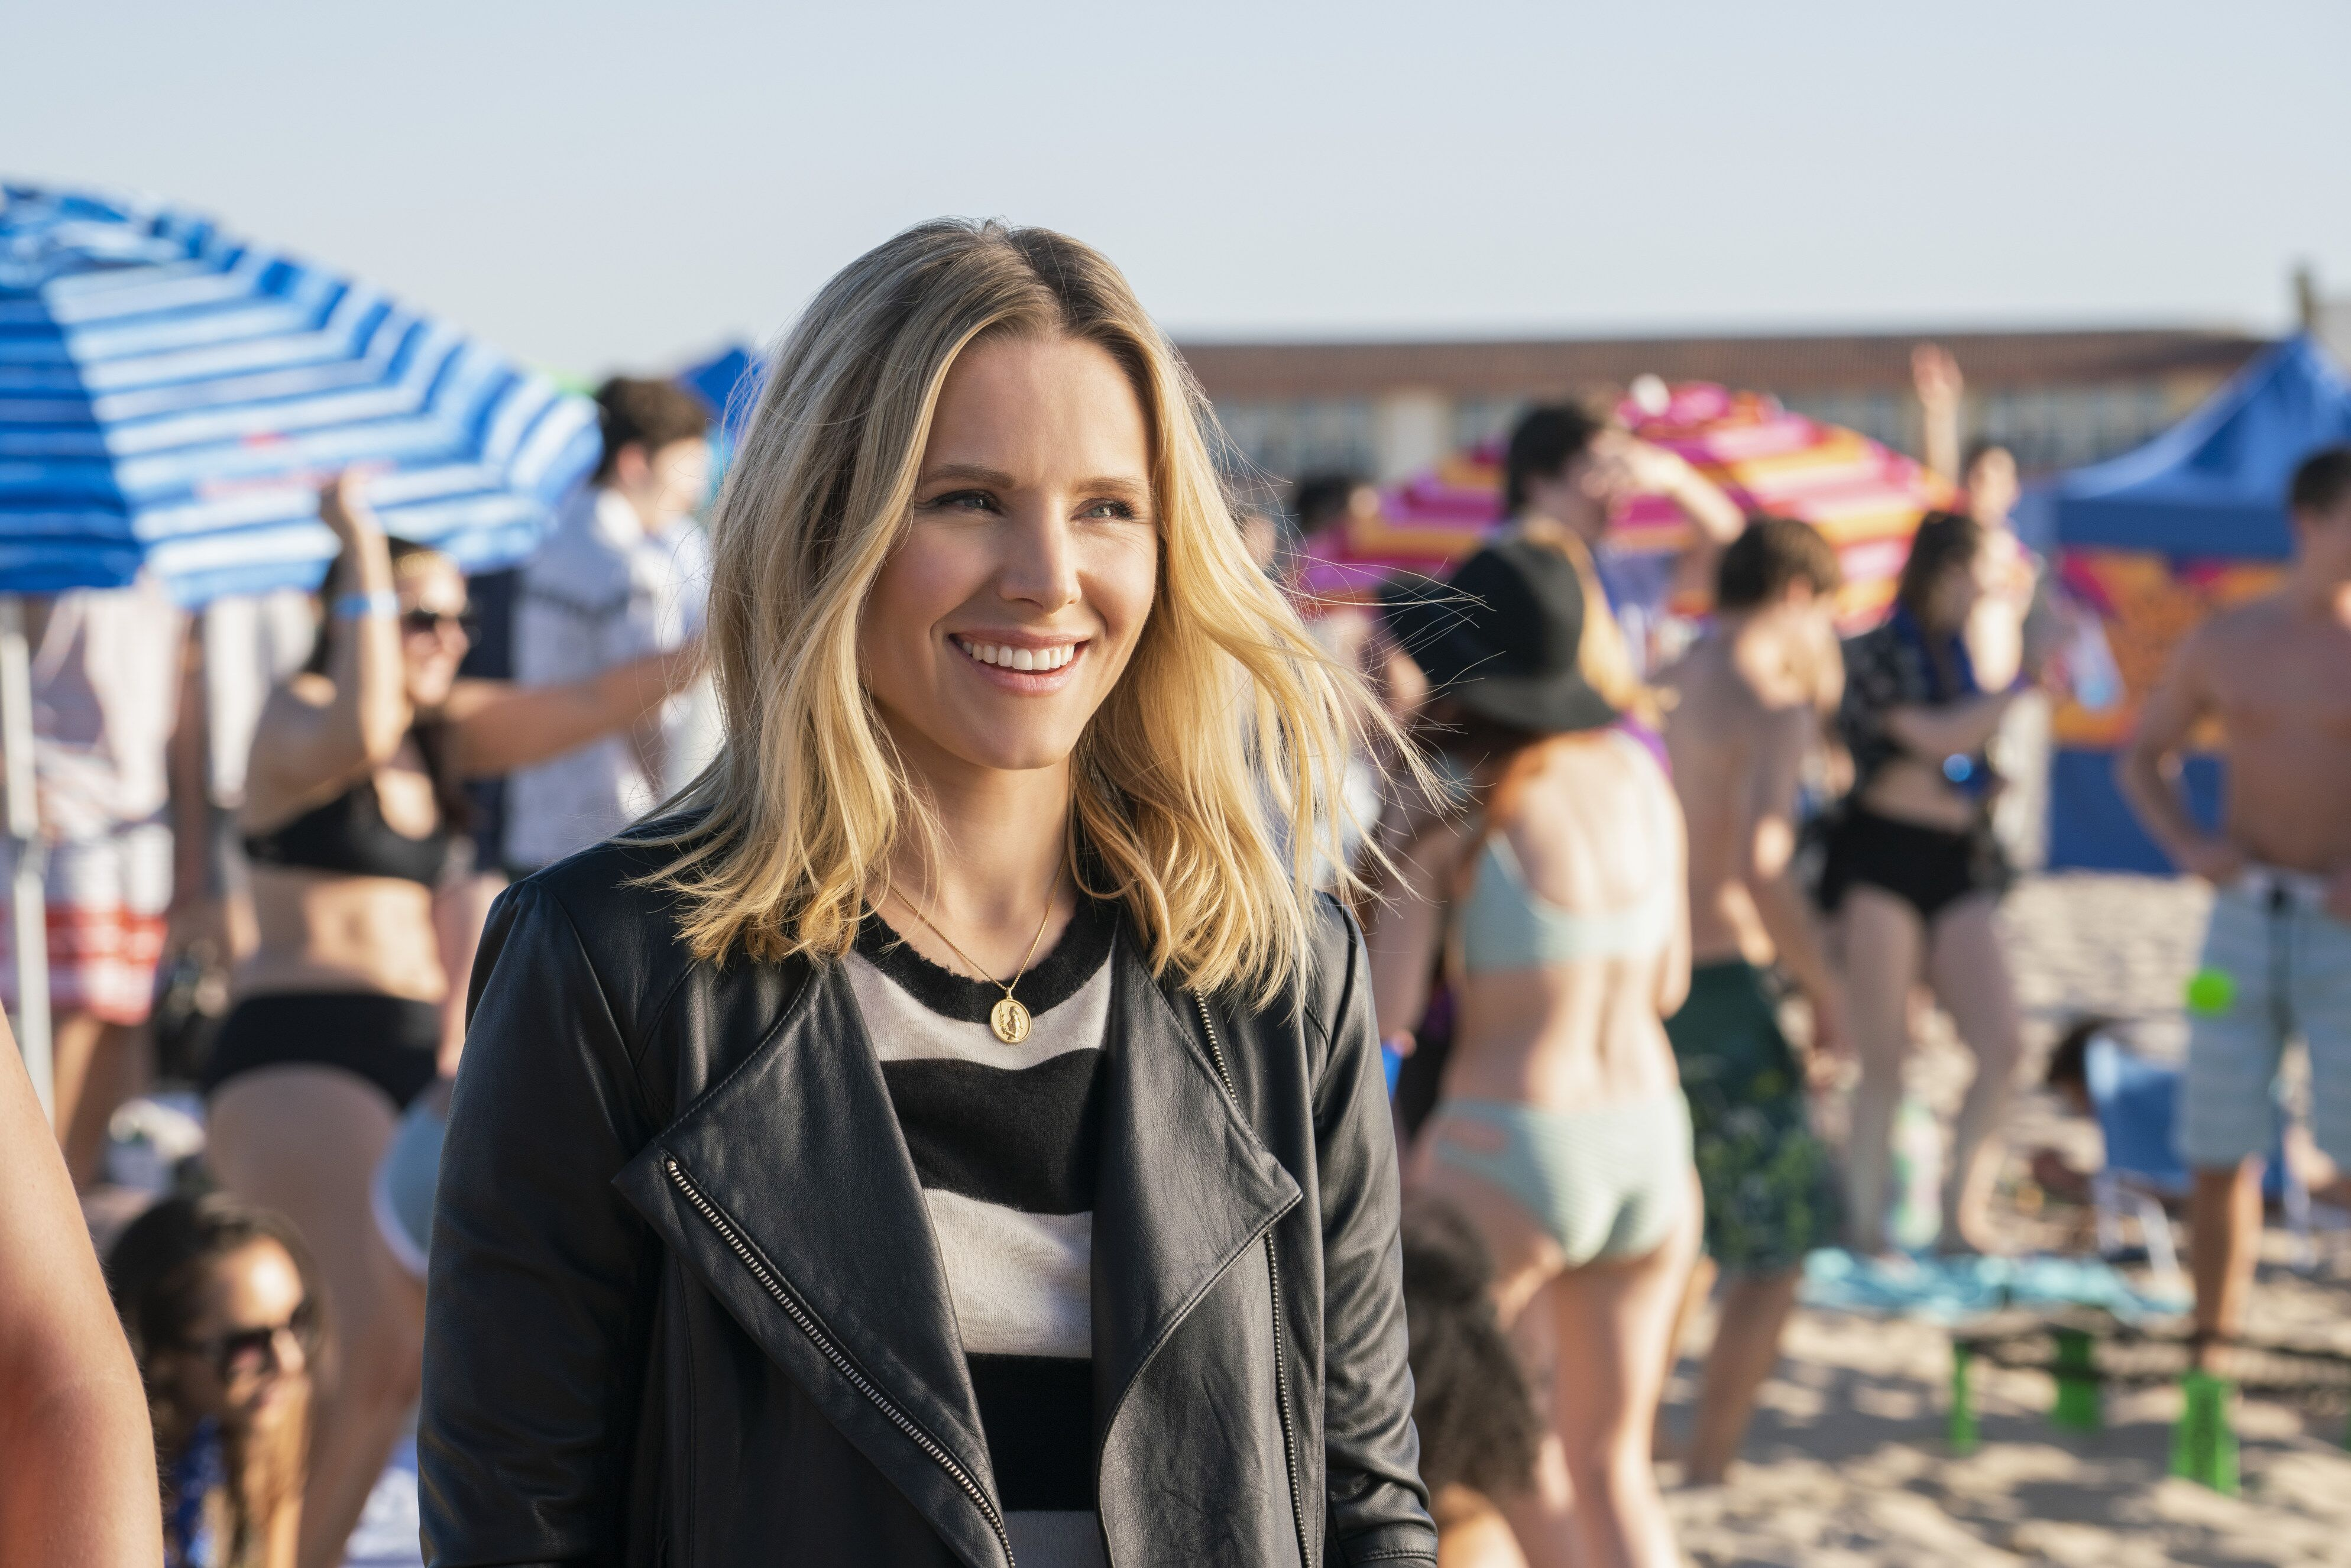 Veronica Mars season 4 premiere: Spring Break Forever